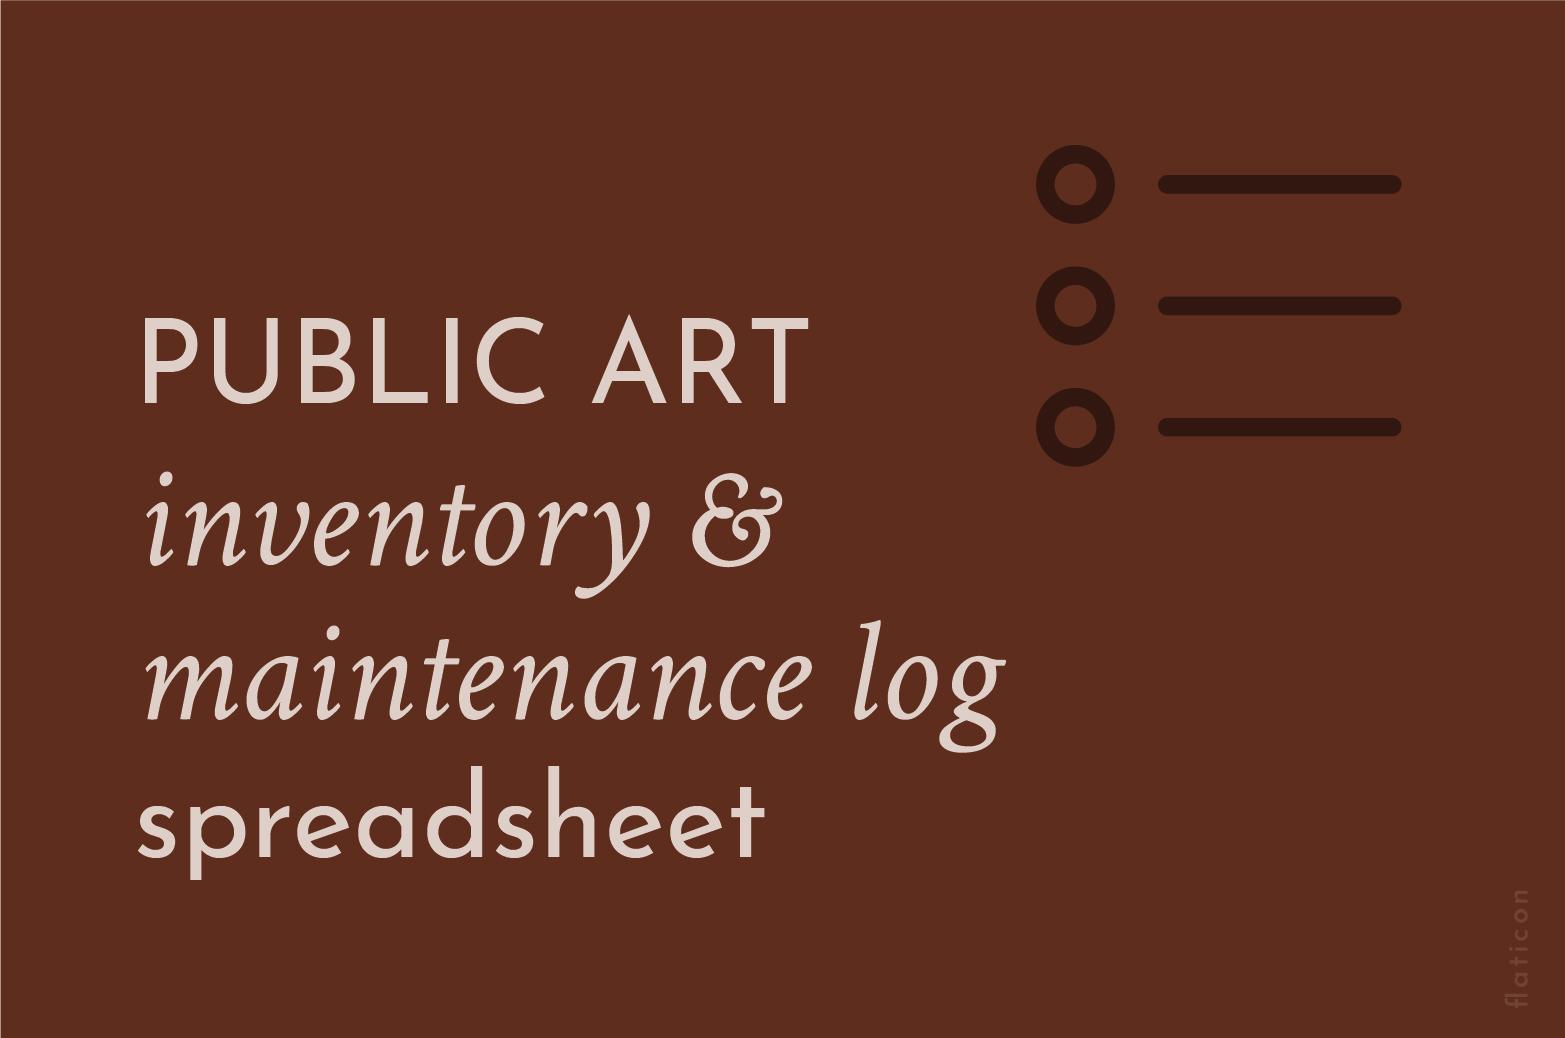 public-art-inventory-spreadsheet-29.jpg